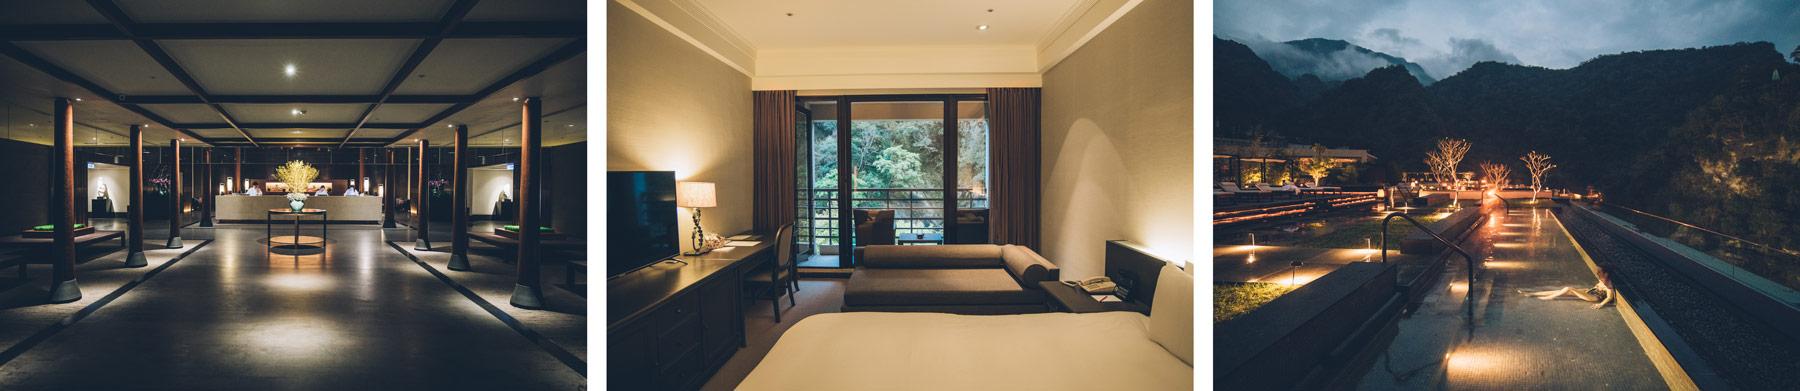 Meilleur hotel à Taroko, Taiwan